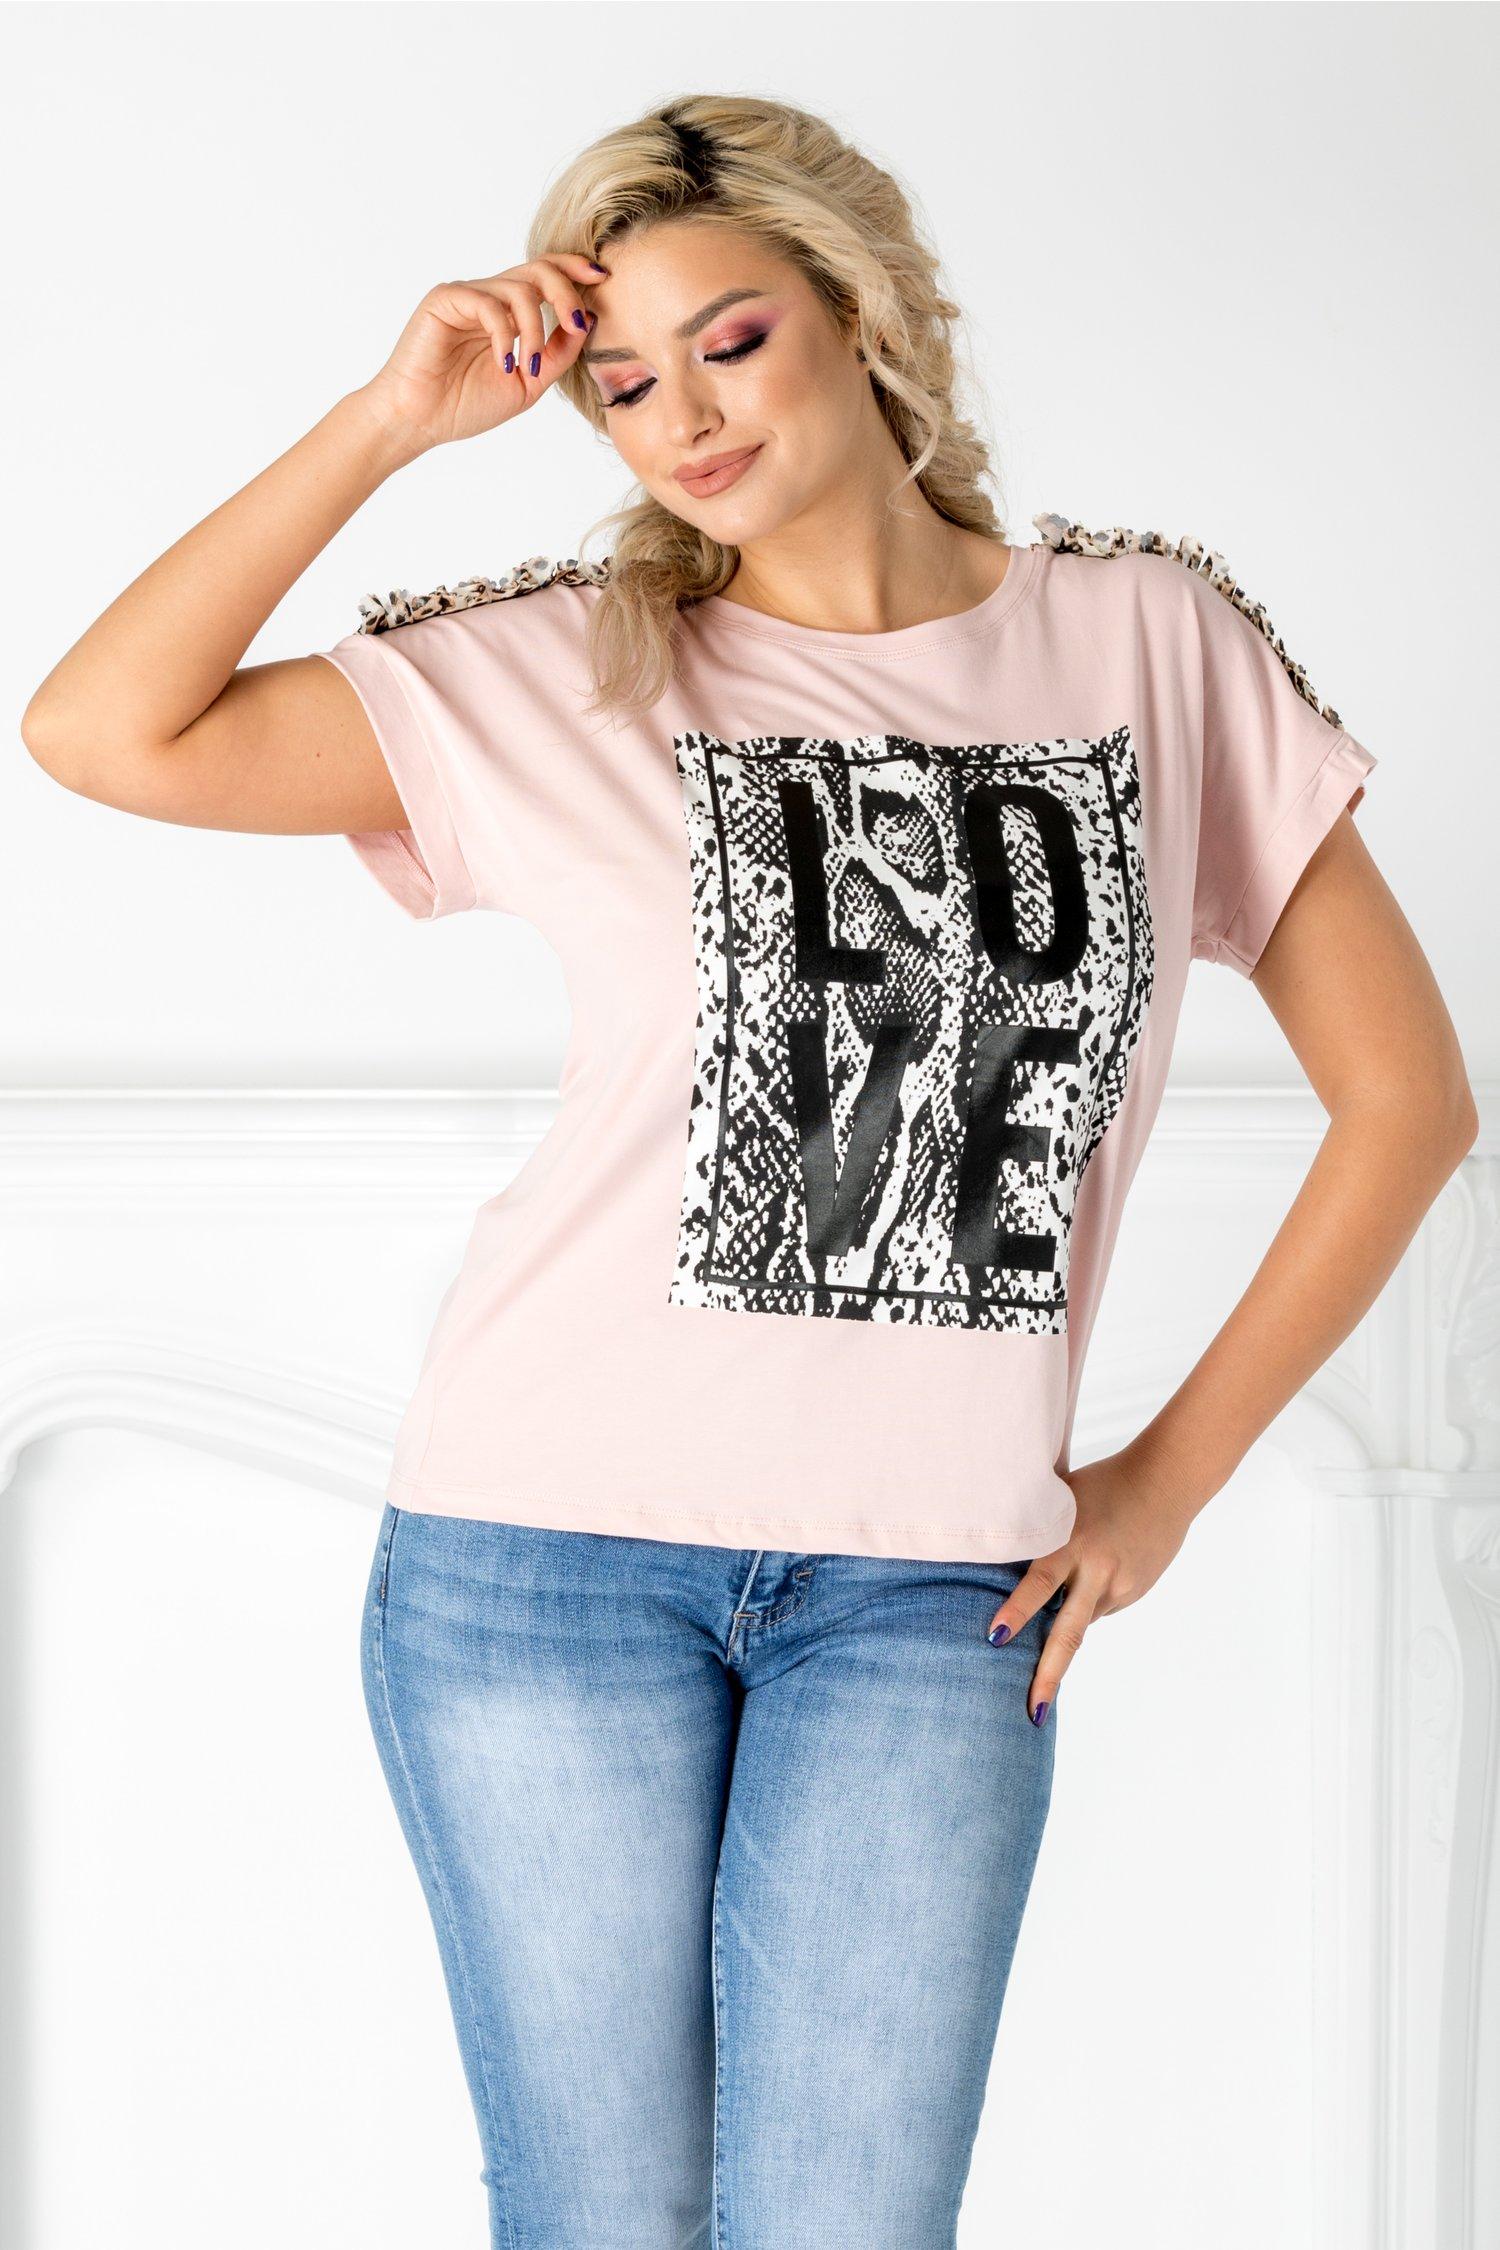 Tricou Love roz cu aplicatie pe bust si la umeri